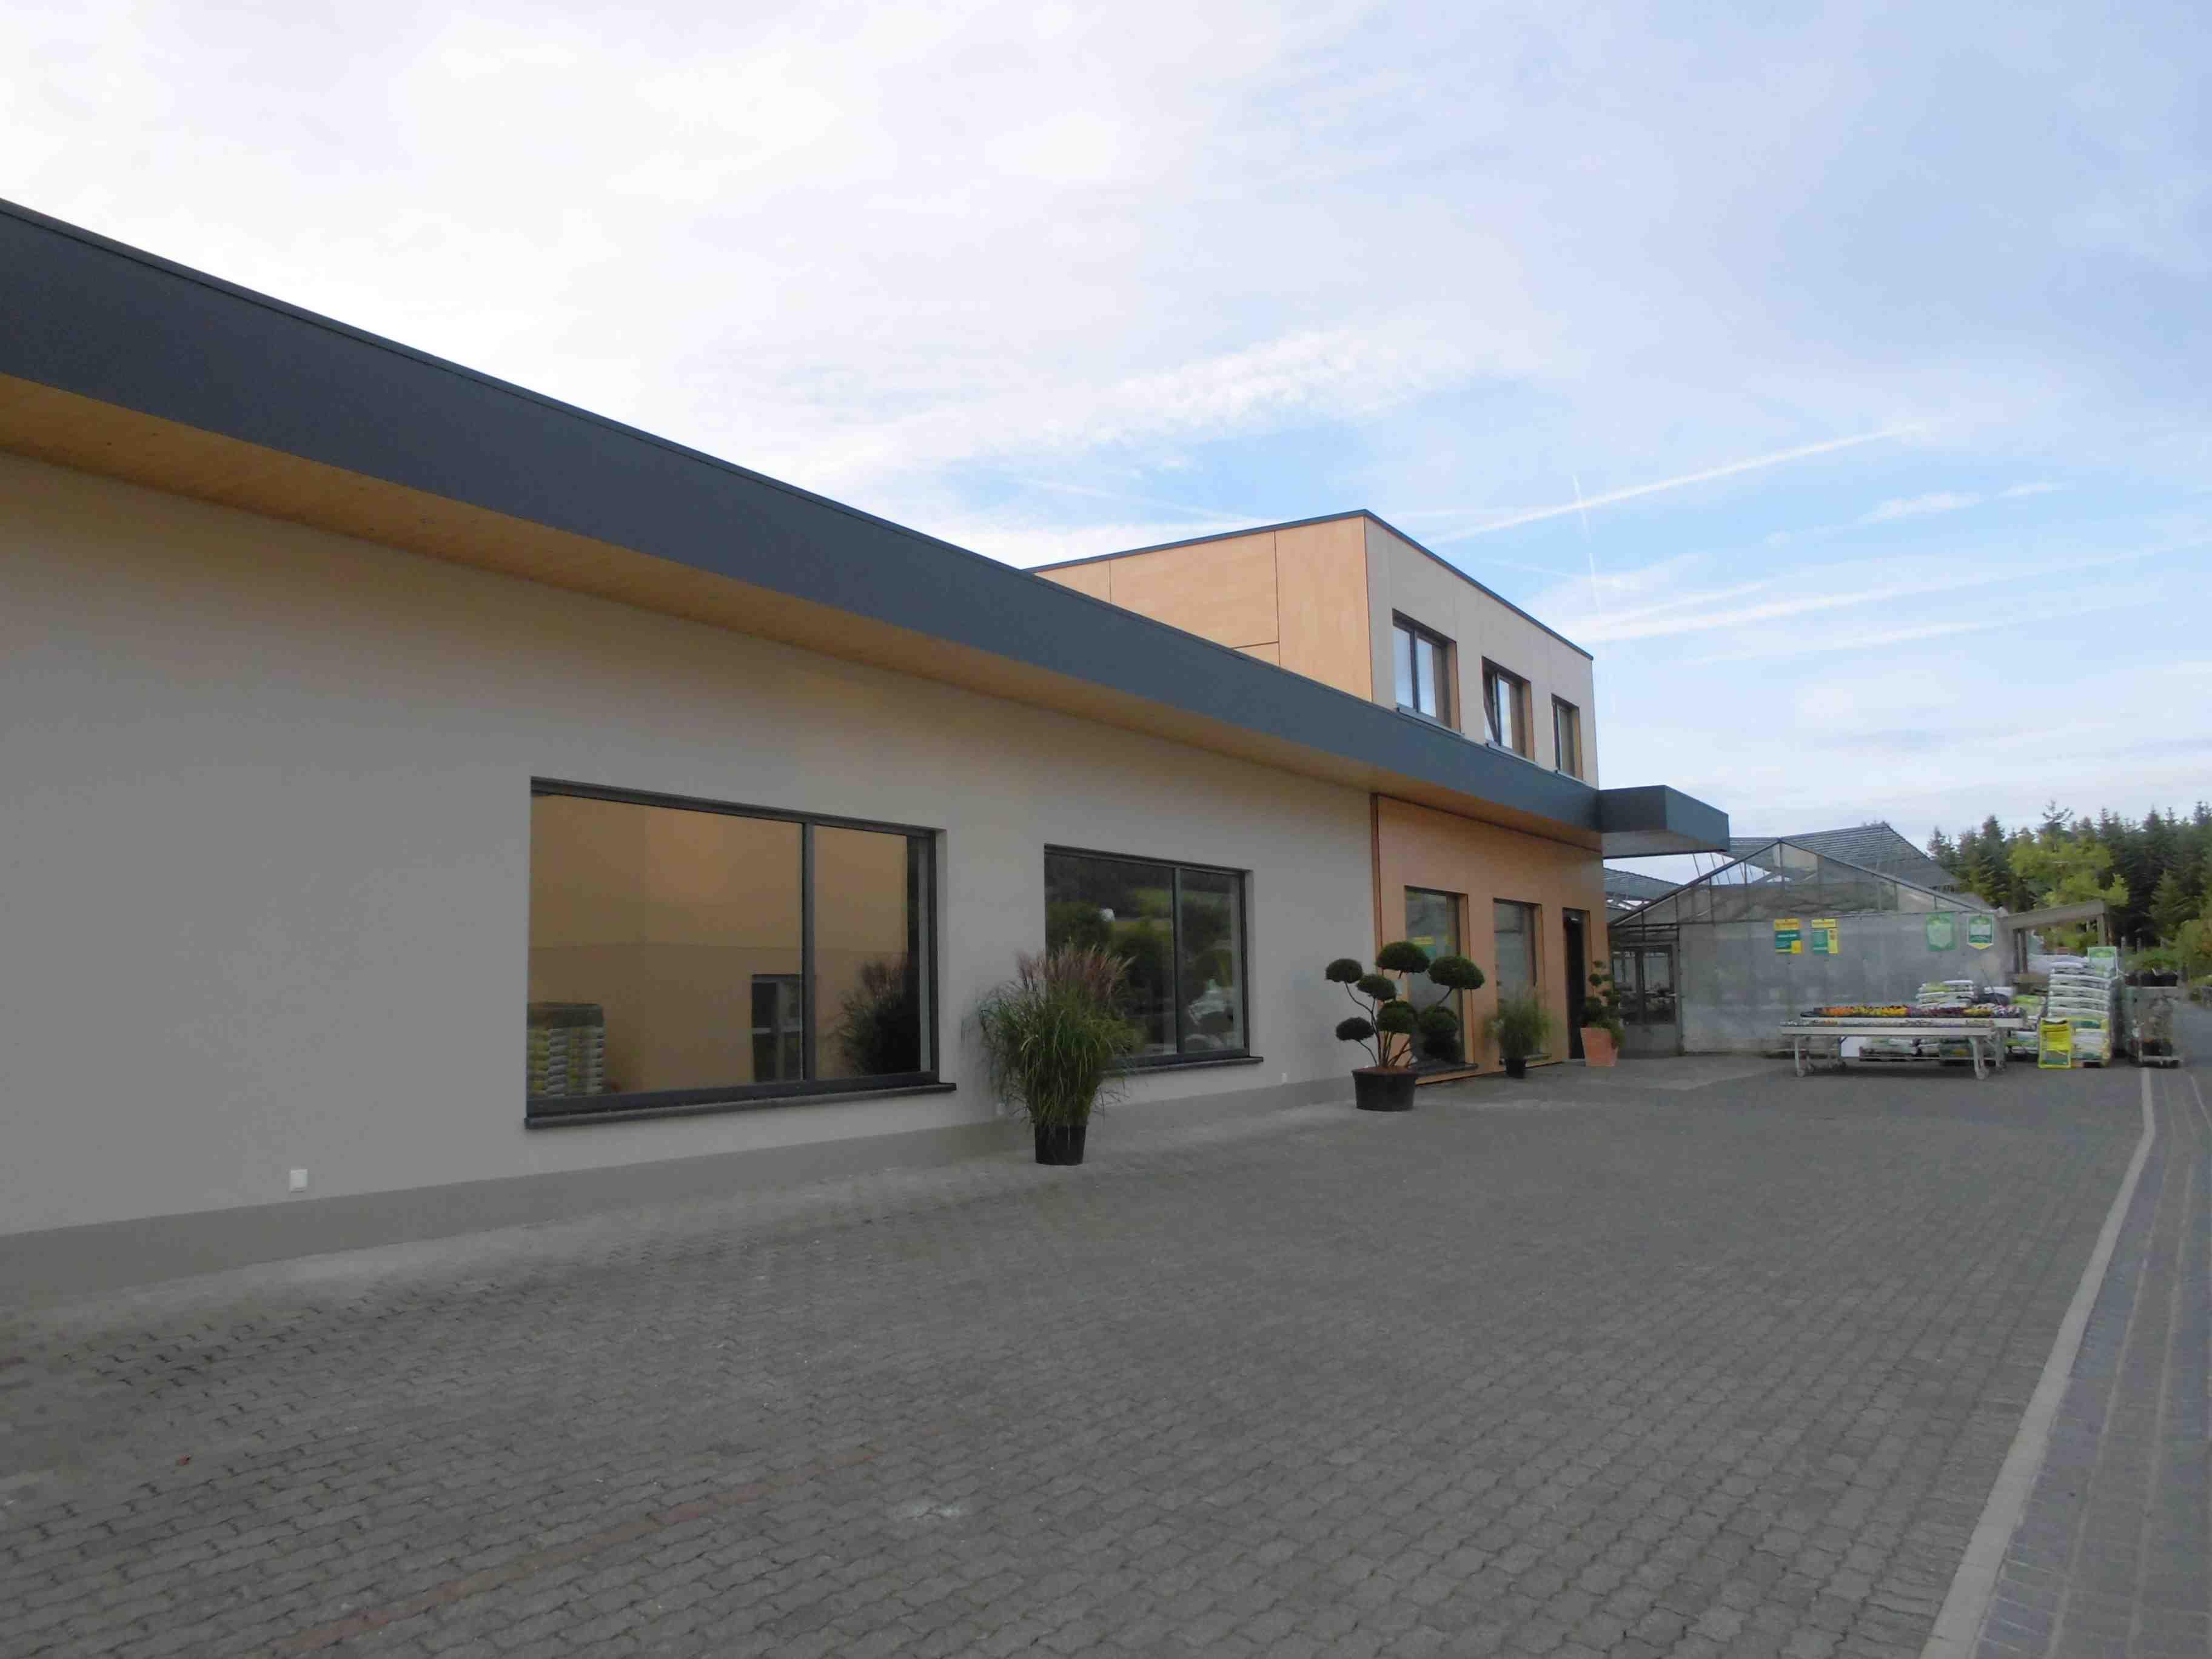 Gartencenter Schmitz floss blockhaus holzrahmen zimmerei architektur gg